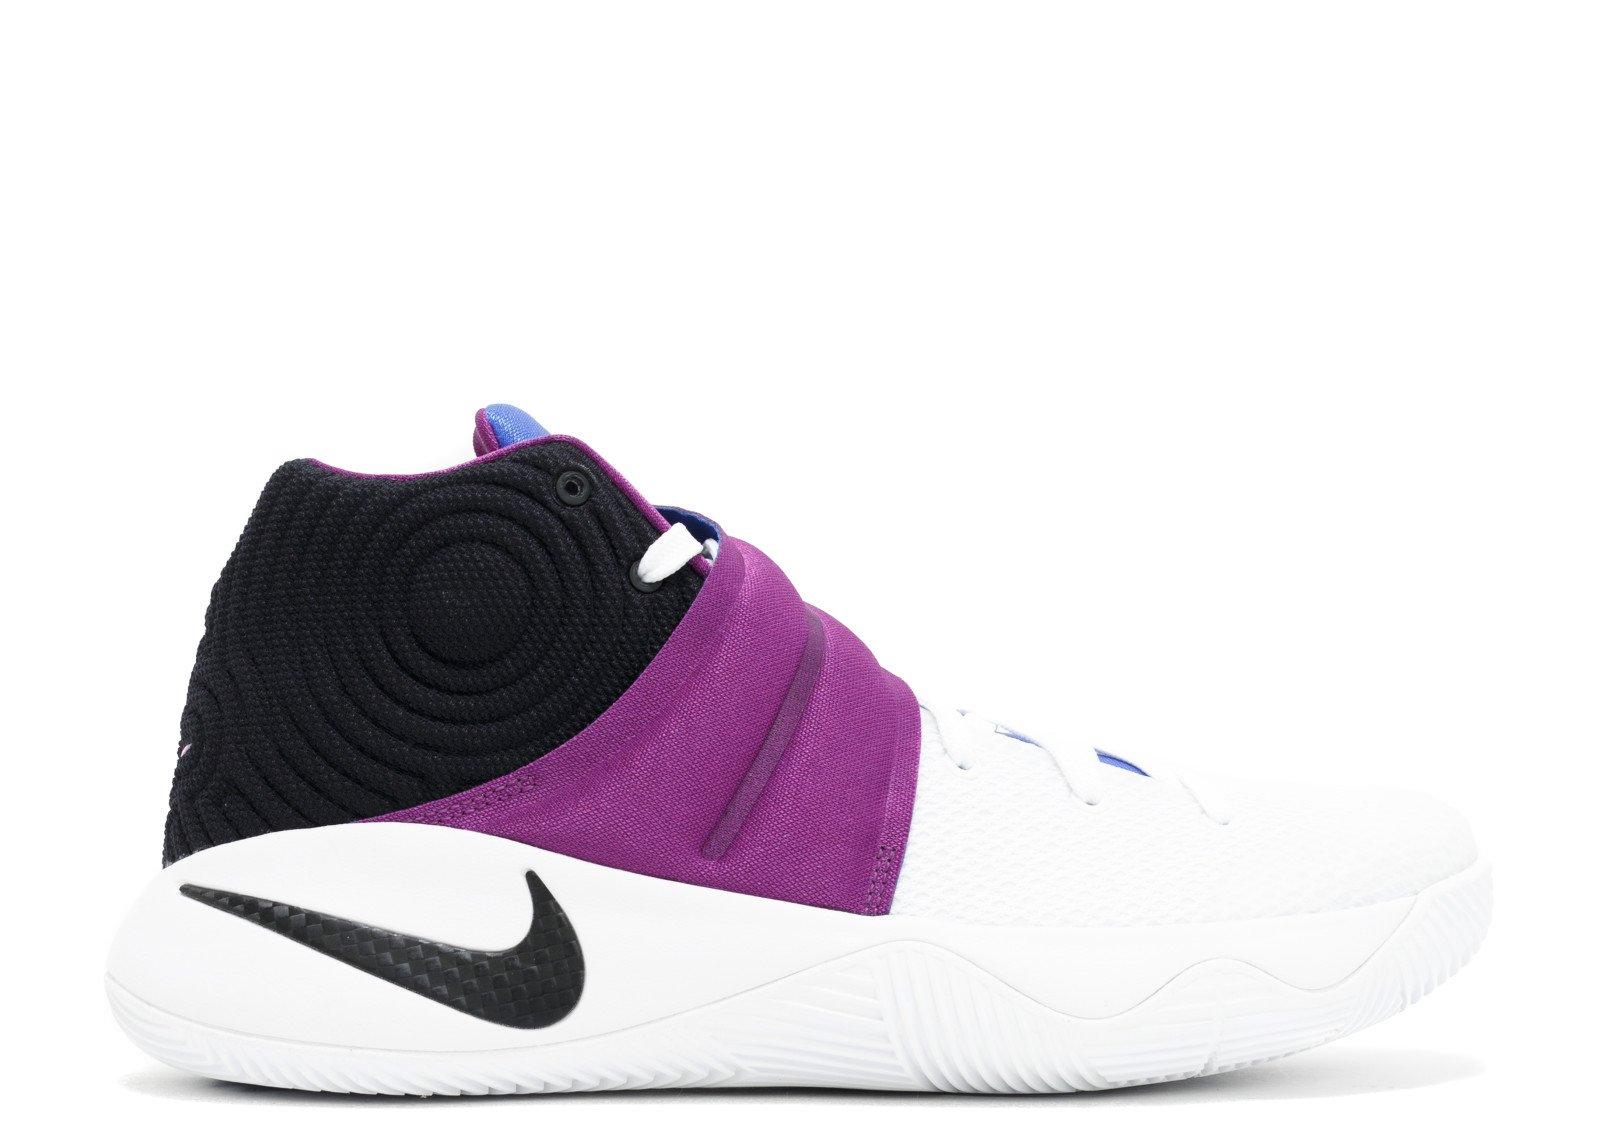 NIKE Boys Kyrie 2 (GS) Basketball Shoes (5Y, White/Black-Bold Berry-Lyon Blue)